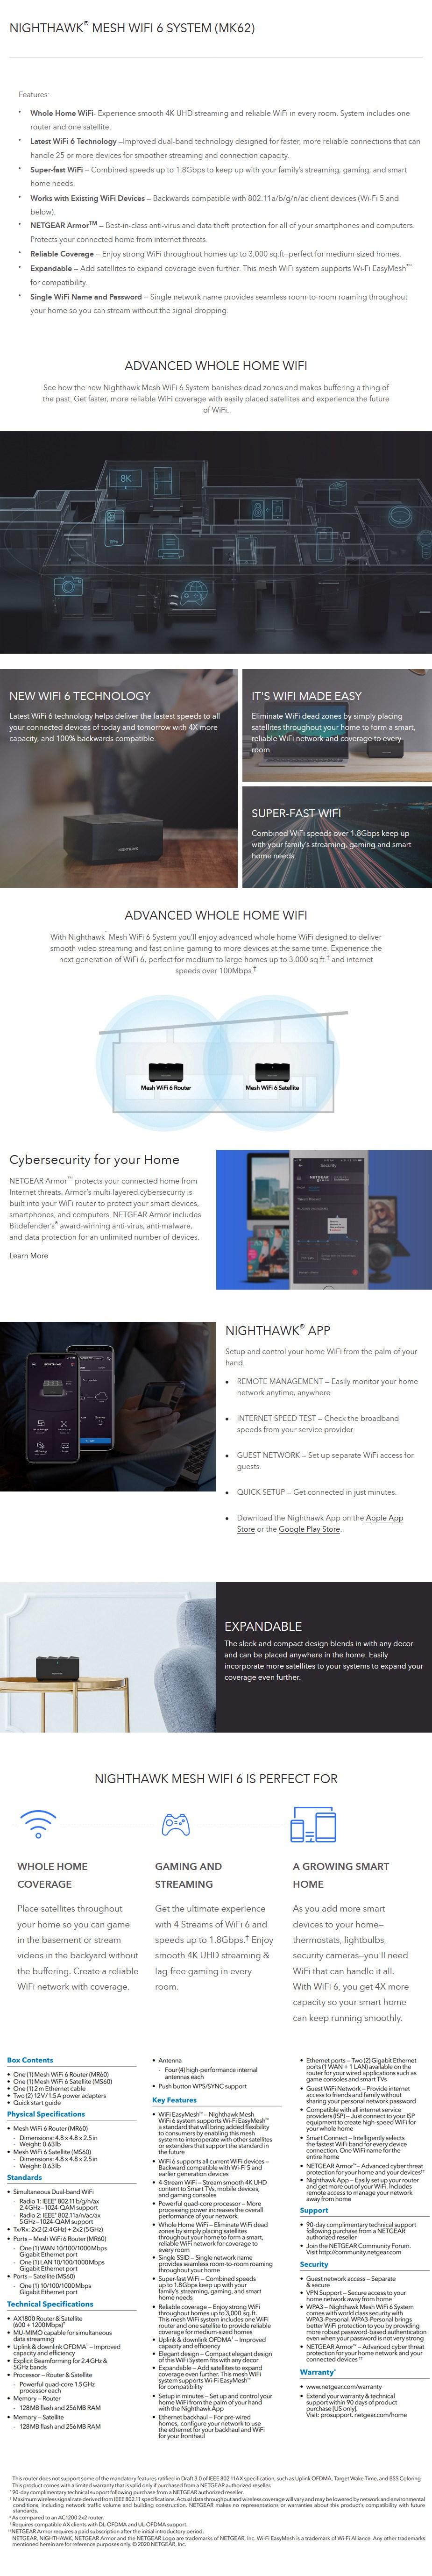 netgear_mk62_nighthawk_ax1800_wifi_6_mesh_router_system_2_pack_ac40020_5.jpg